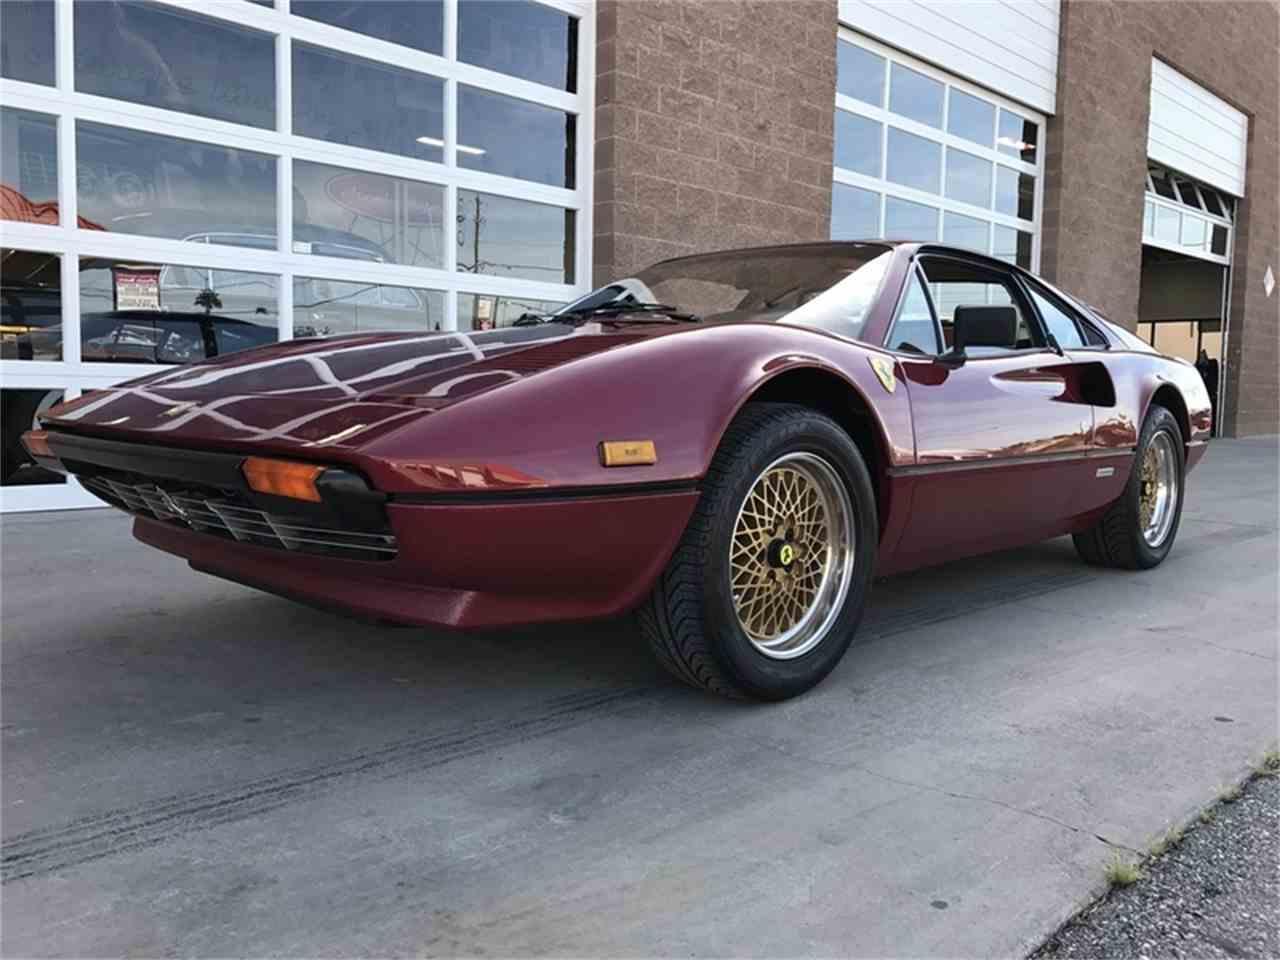 1981 Ferrari GTBi for Sale - CC-992533